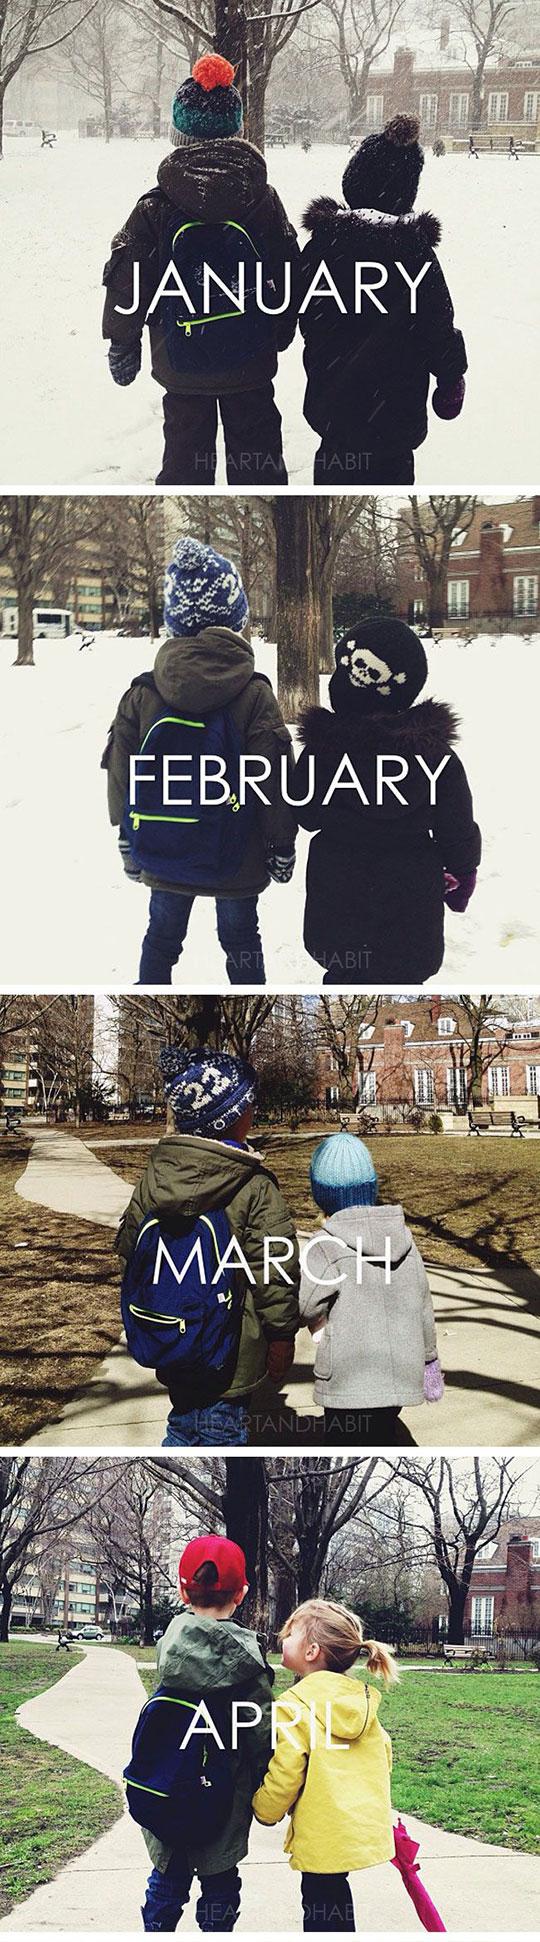 Same spot every month calendar...